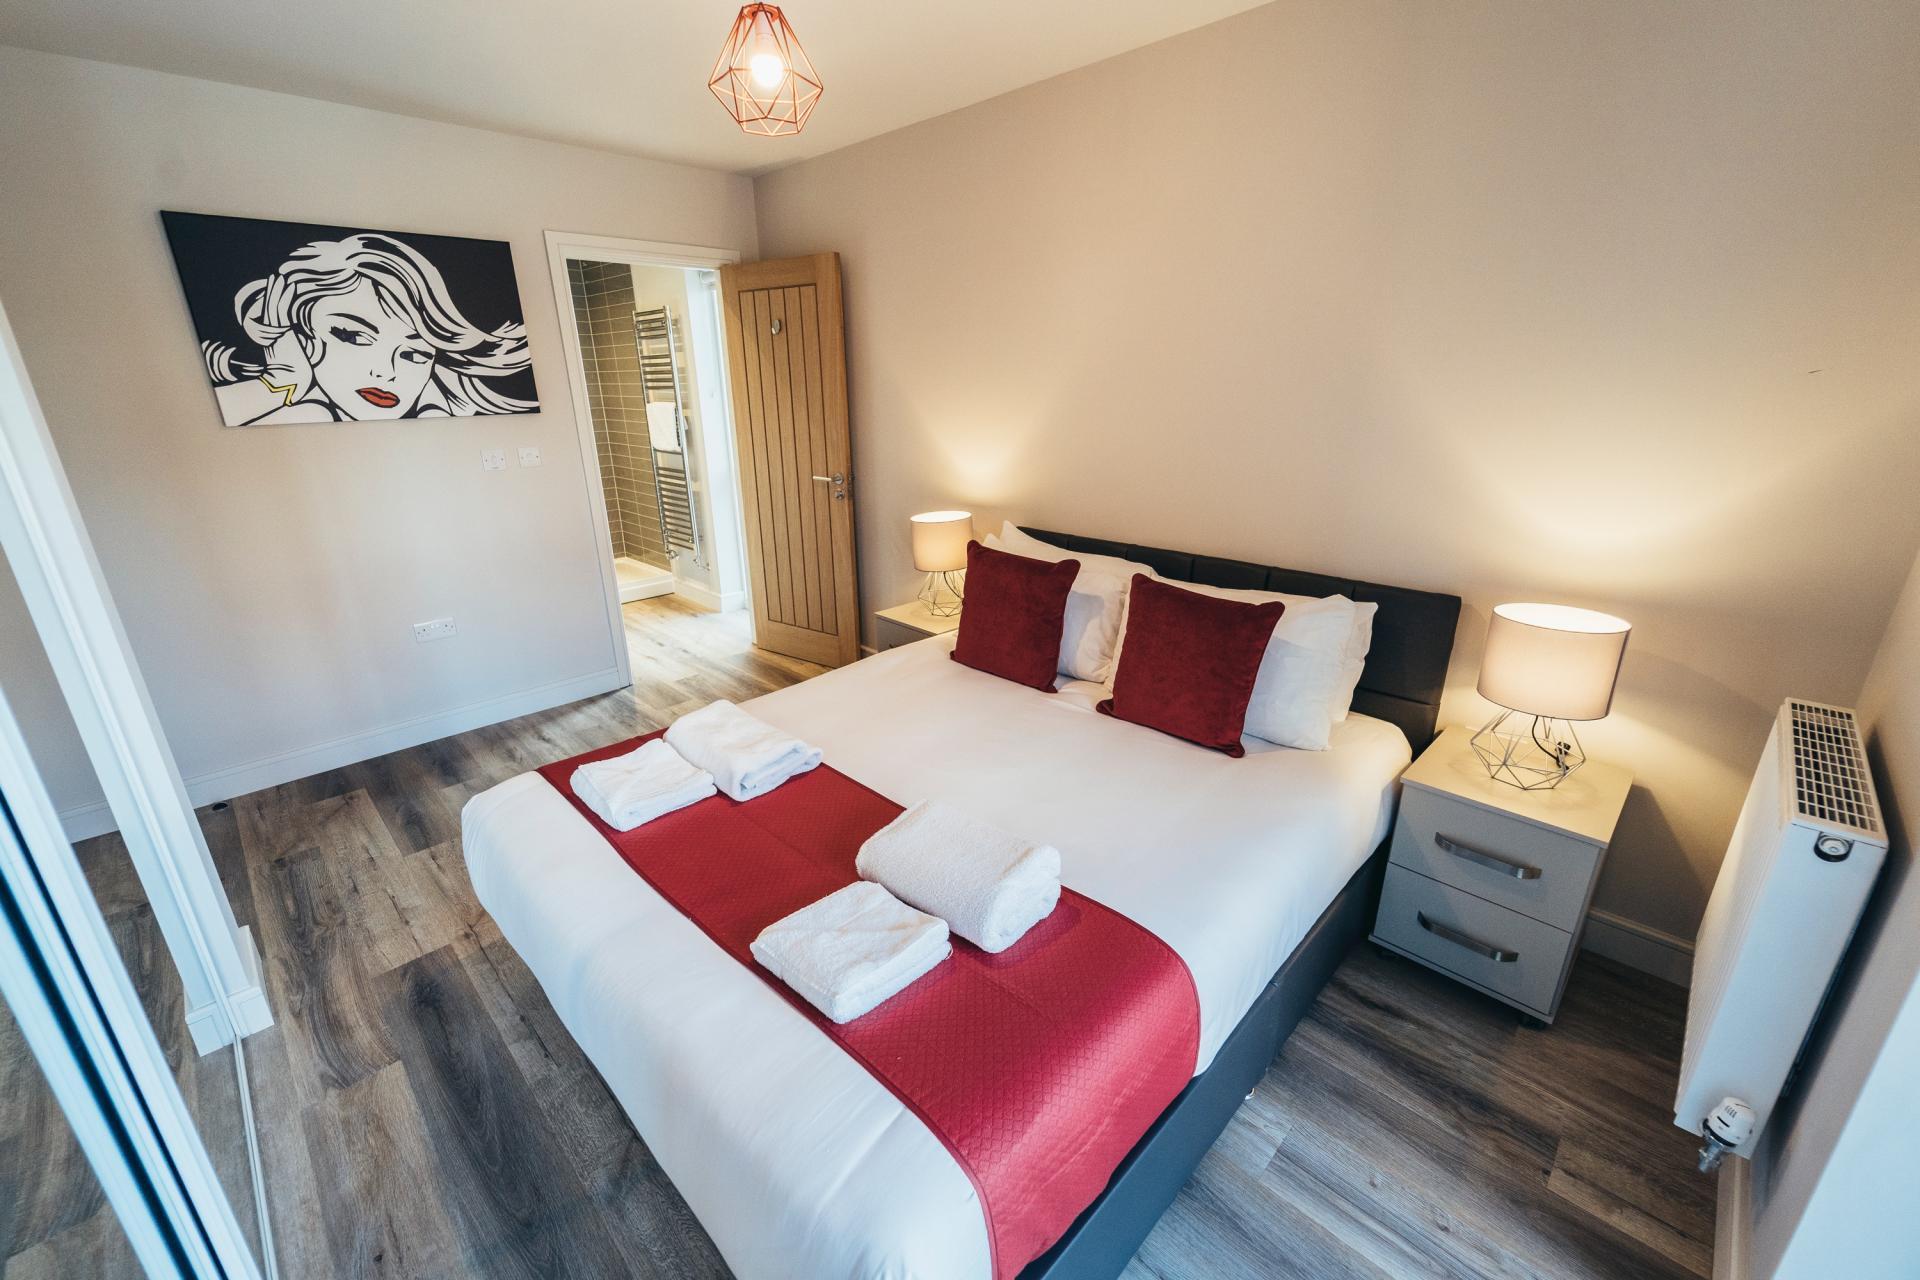 Spacious bedroom at Devonshire Court Apartments, West Bridgford, Nottingham - Citybase Apartments